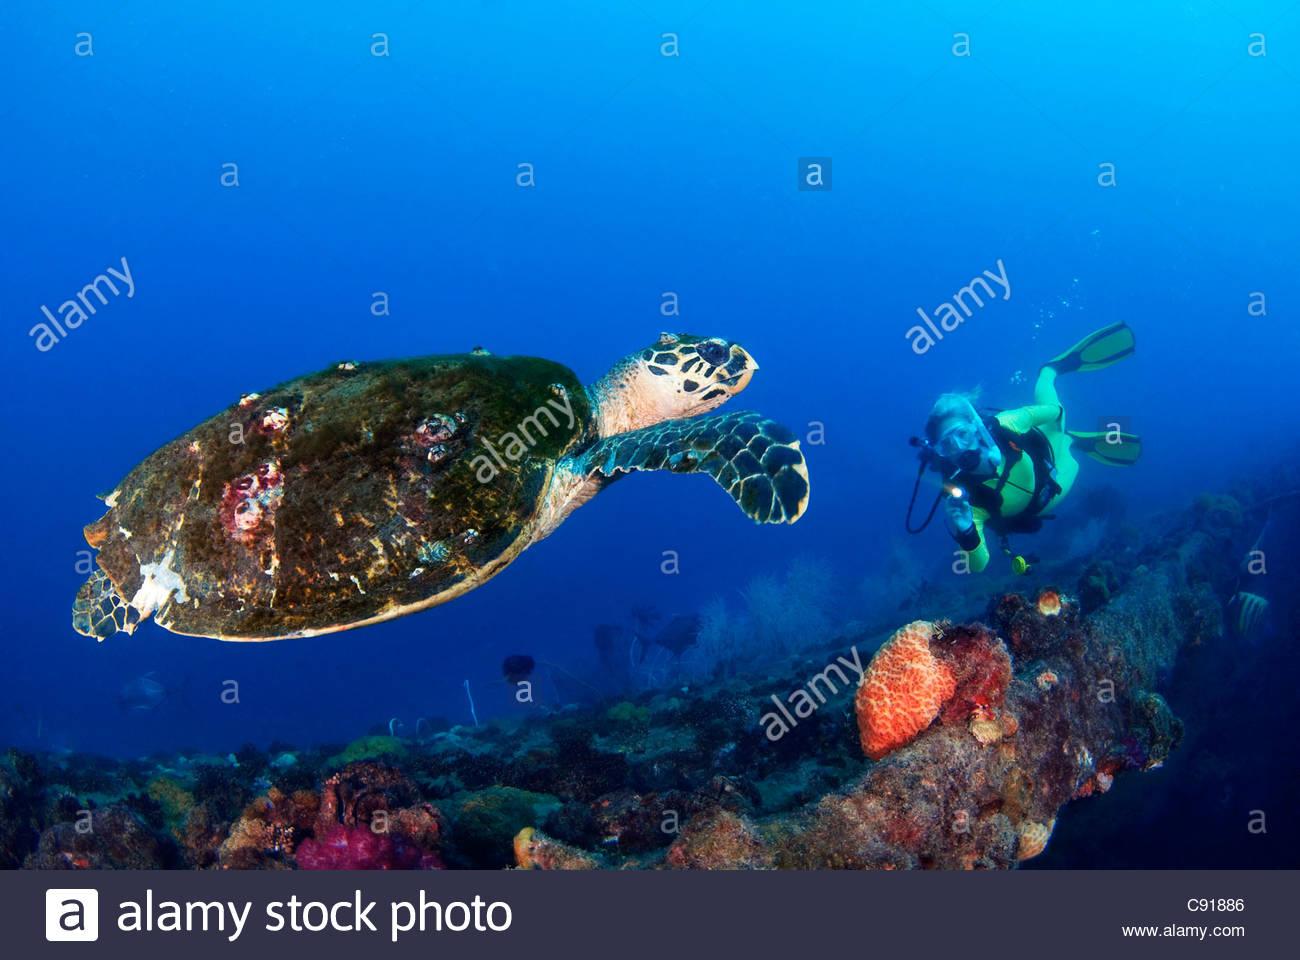 Hawksbill Turtle (Eretmochelys Imbricata) at the SS Yongala Shipwreck Great Barrier Reef QLD Australia - Stock Image